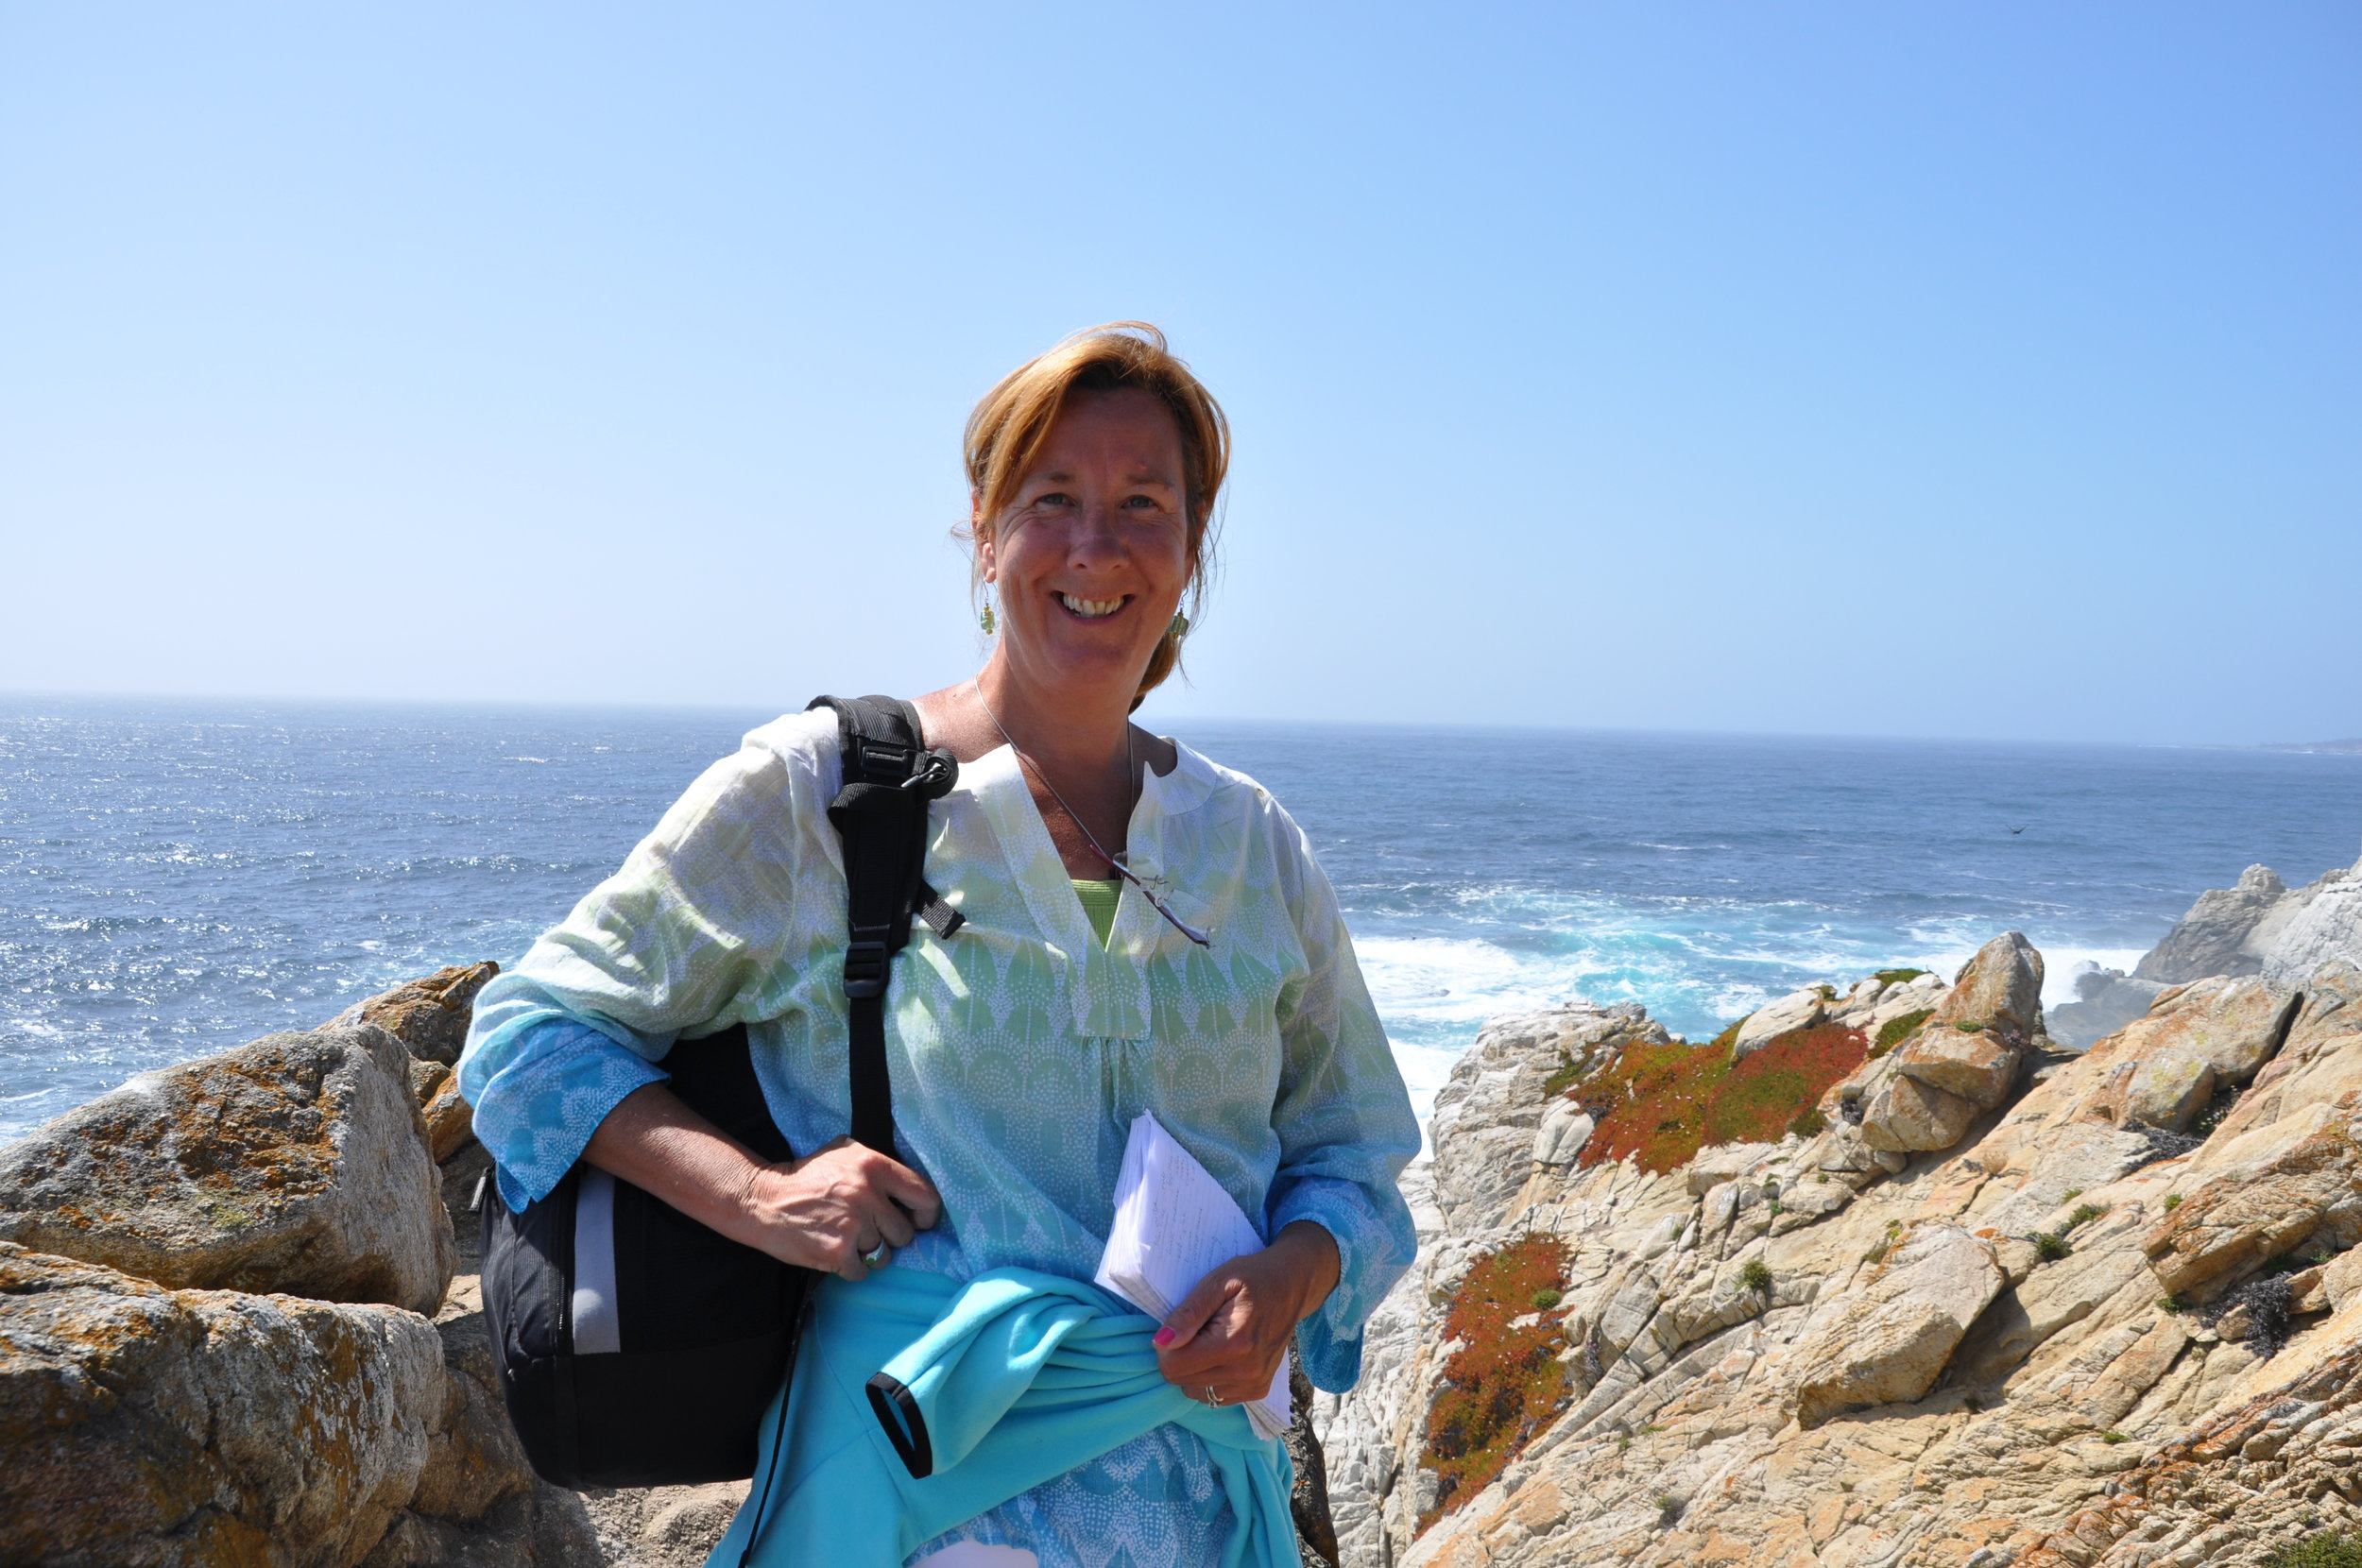 Meg Pier